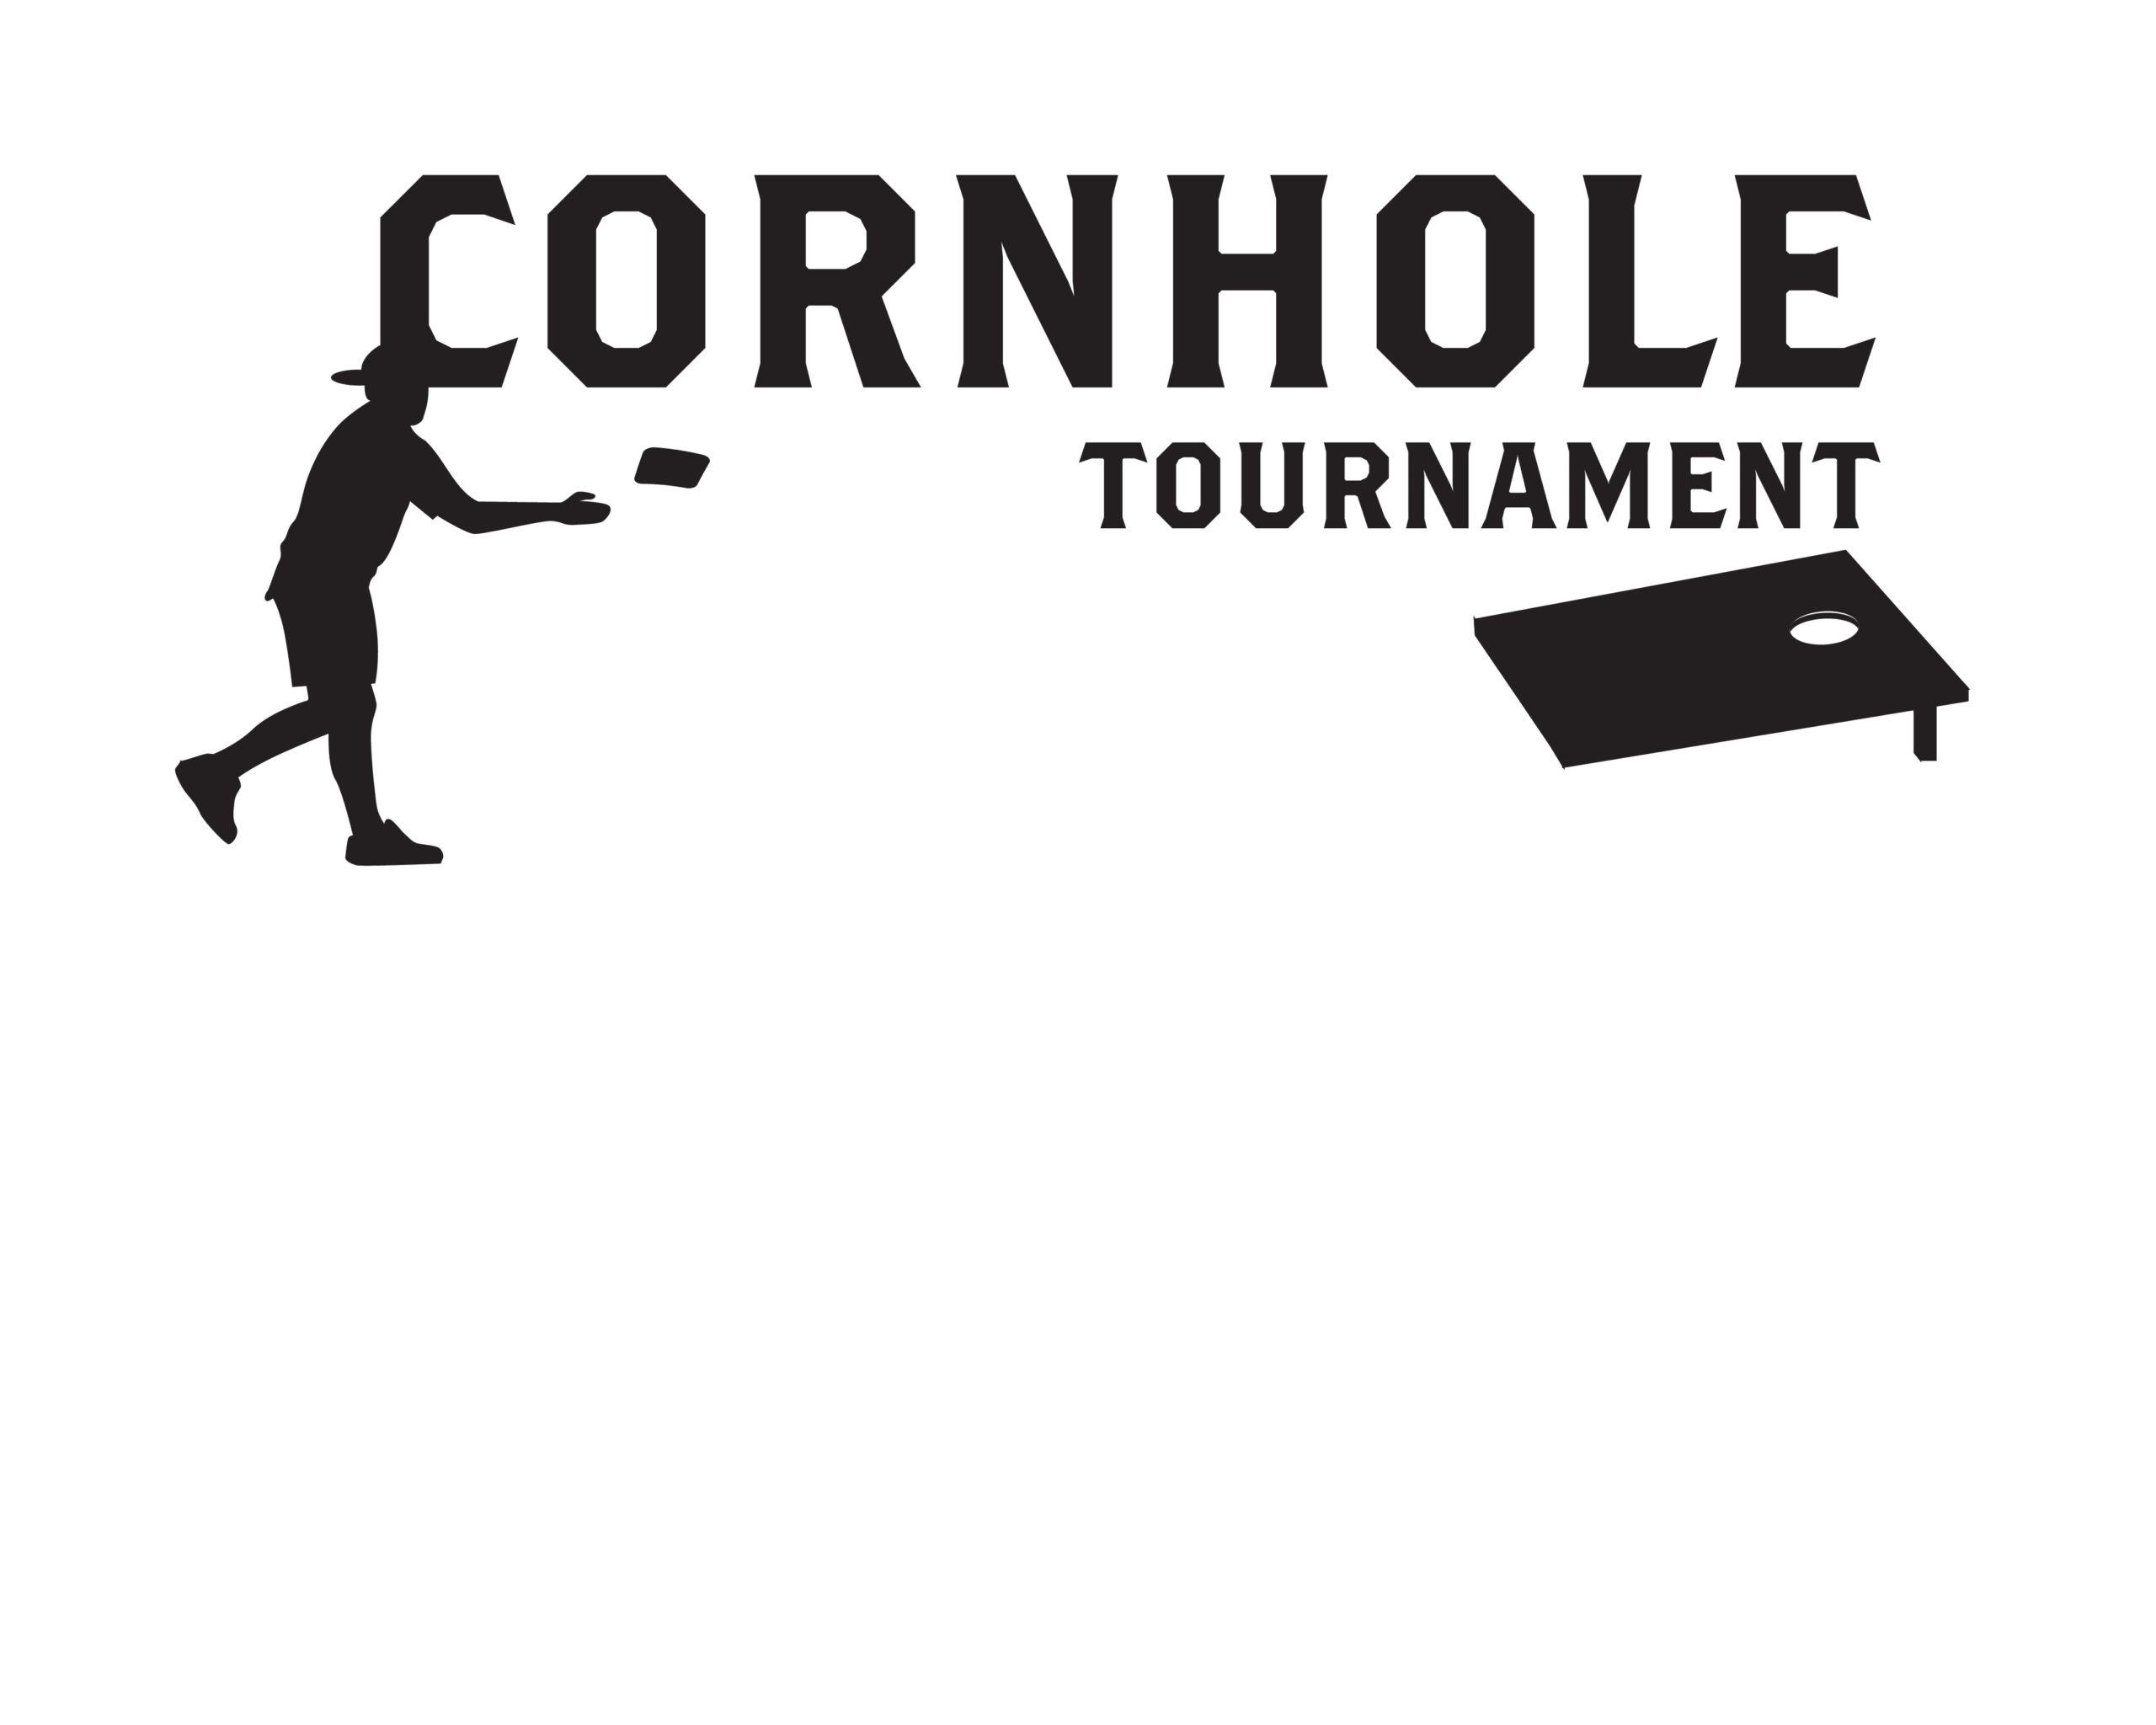 Additional Option per Attendee - Cornhole